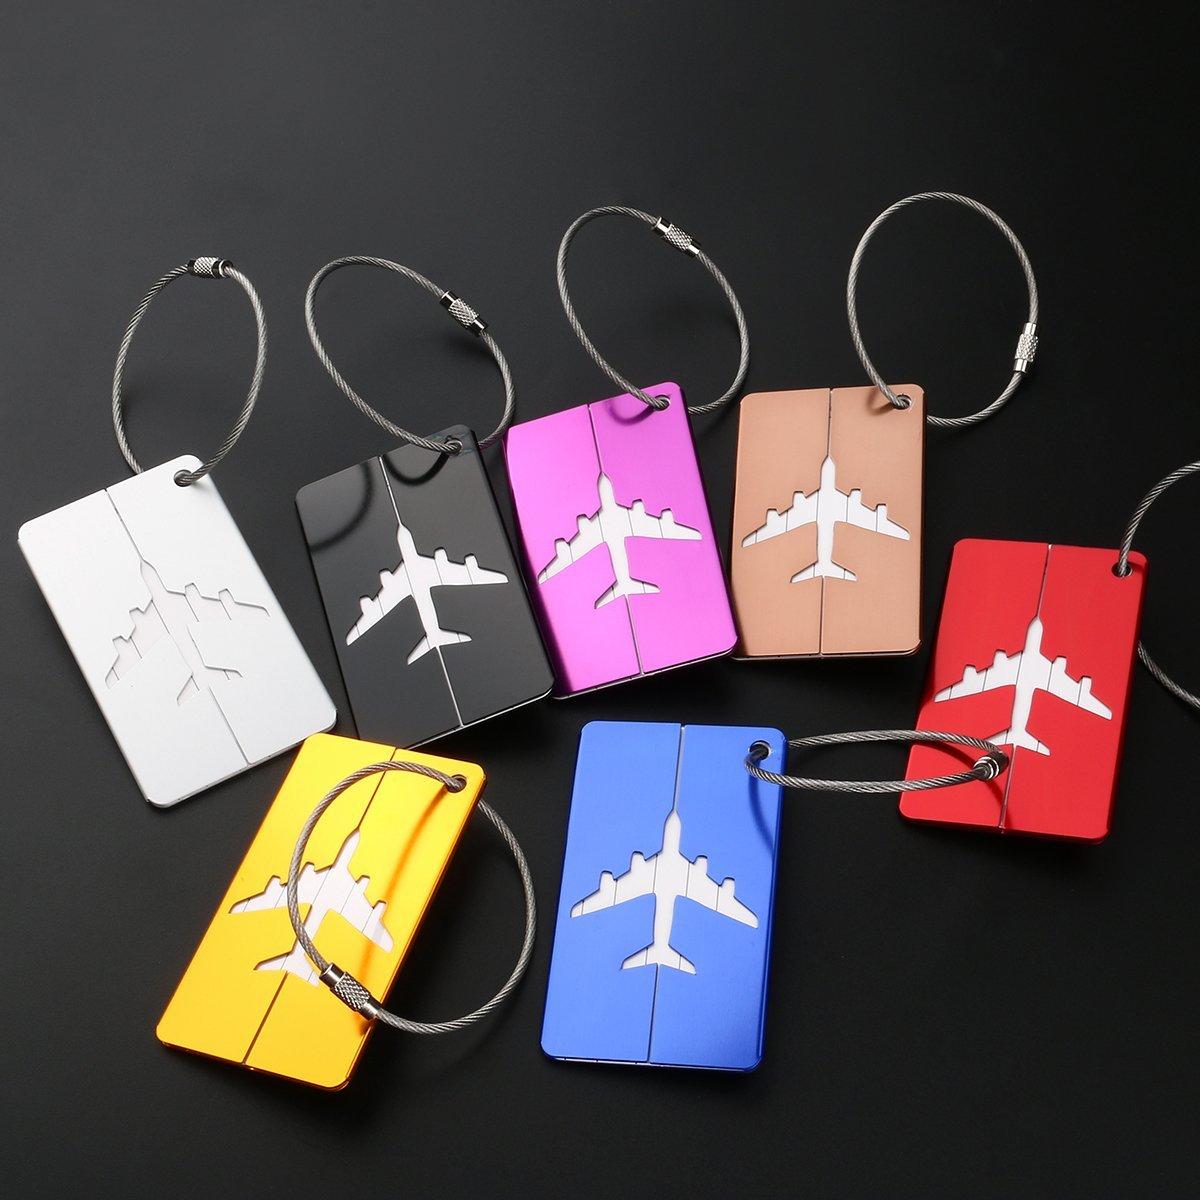 7 Kofferanhänger aus Aluminium für 1,97€ Amazon Prime